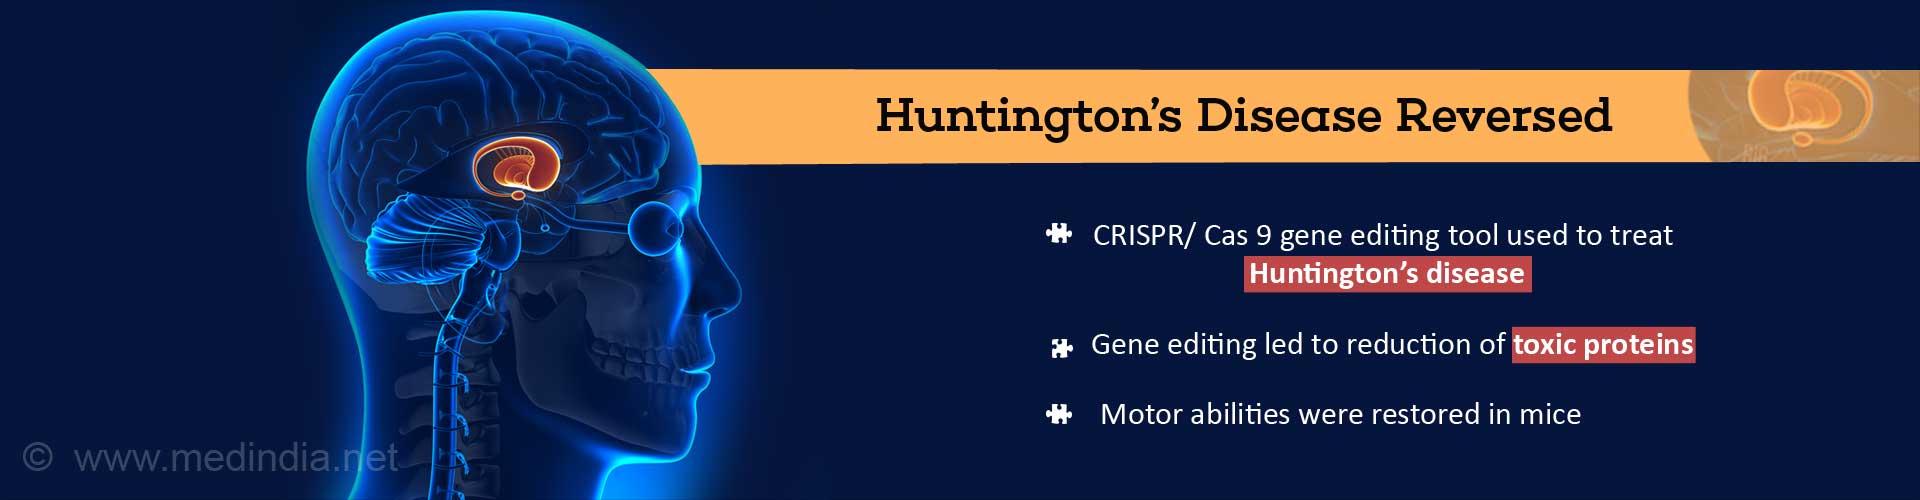 Huntington's Disease : Gene Editing Reverses Symptoms